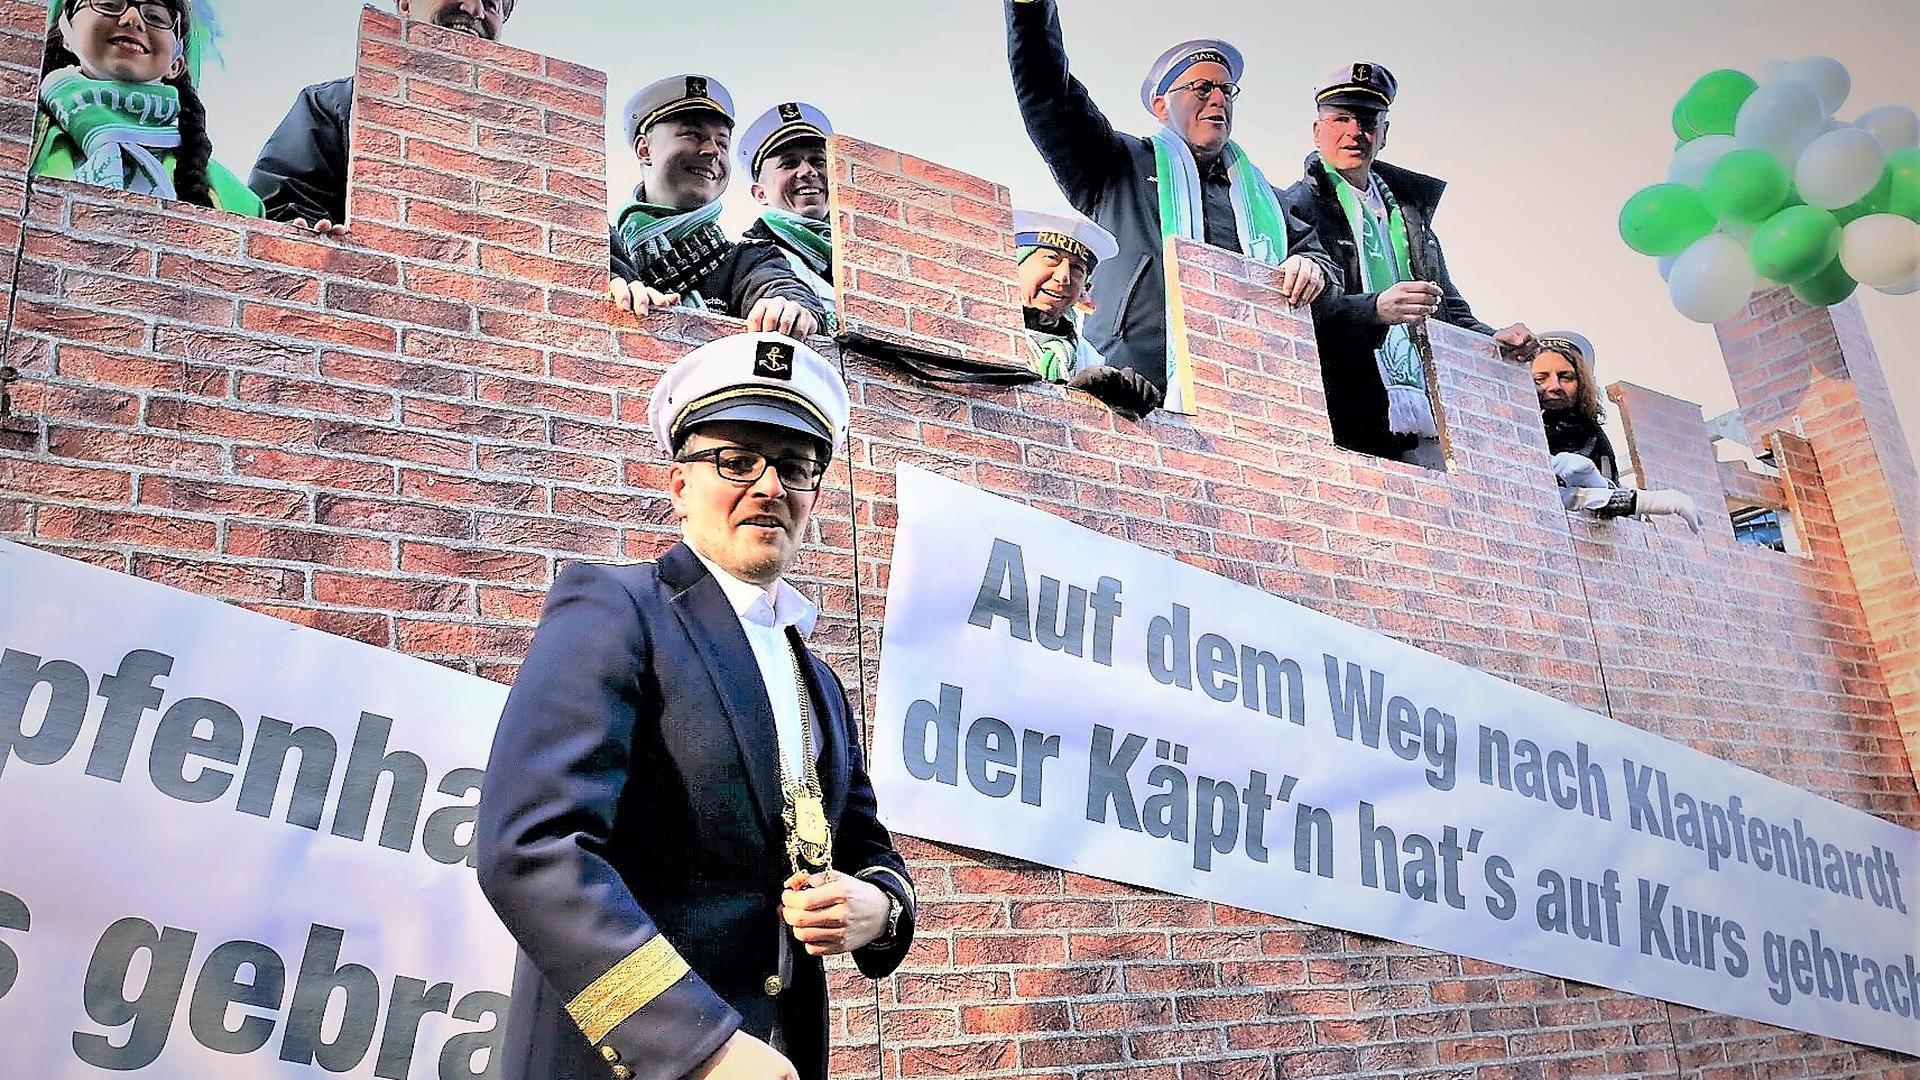 Narretei: Pforzheims OB Peter Boch als Klapfenhardt-Kapitän beim Fastnachtsumzug 2018 in Pforzheim